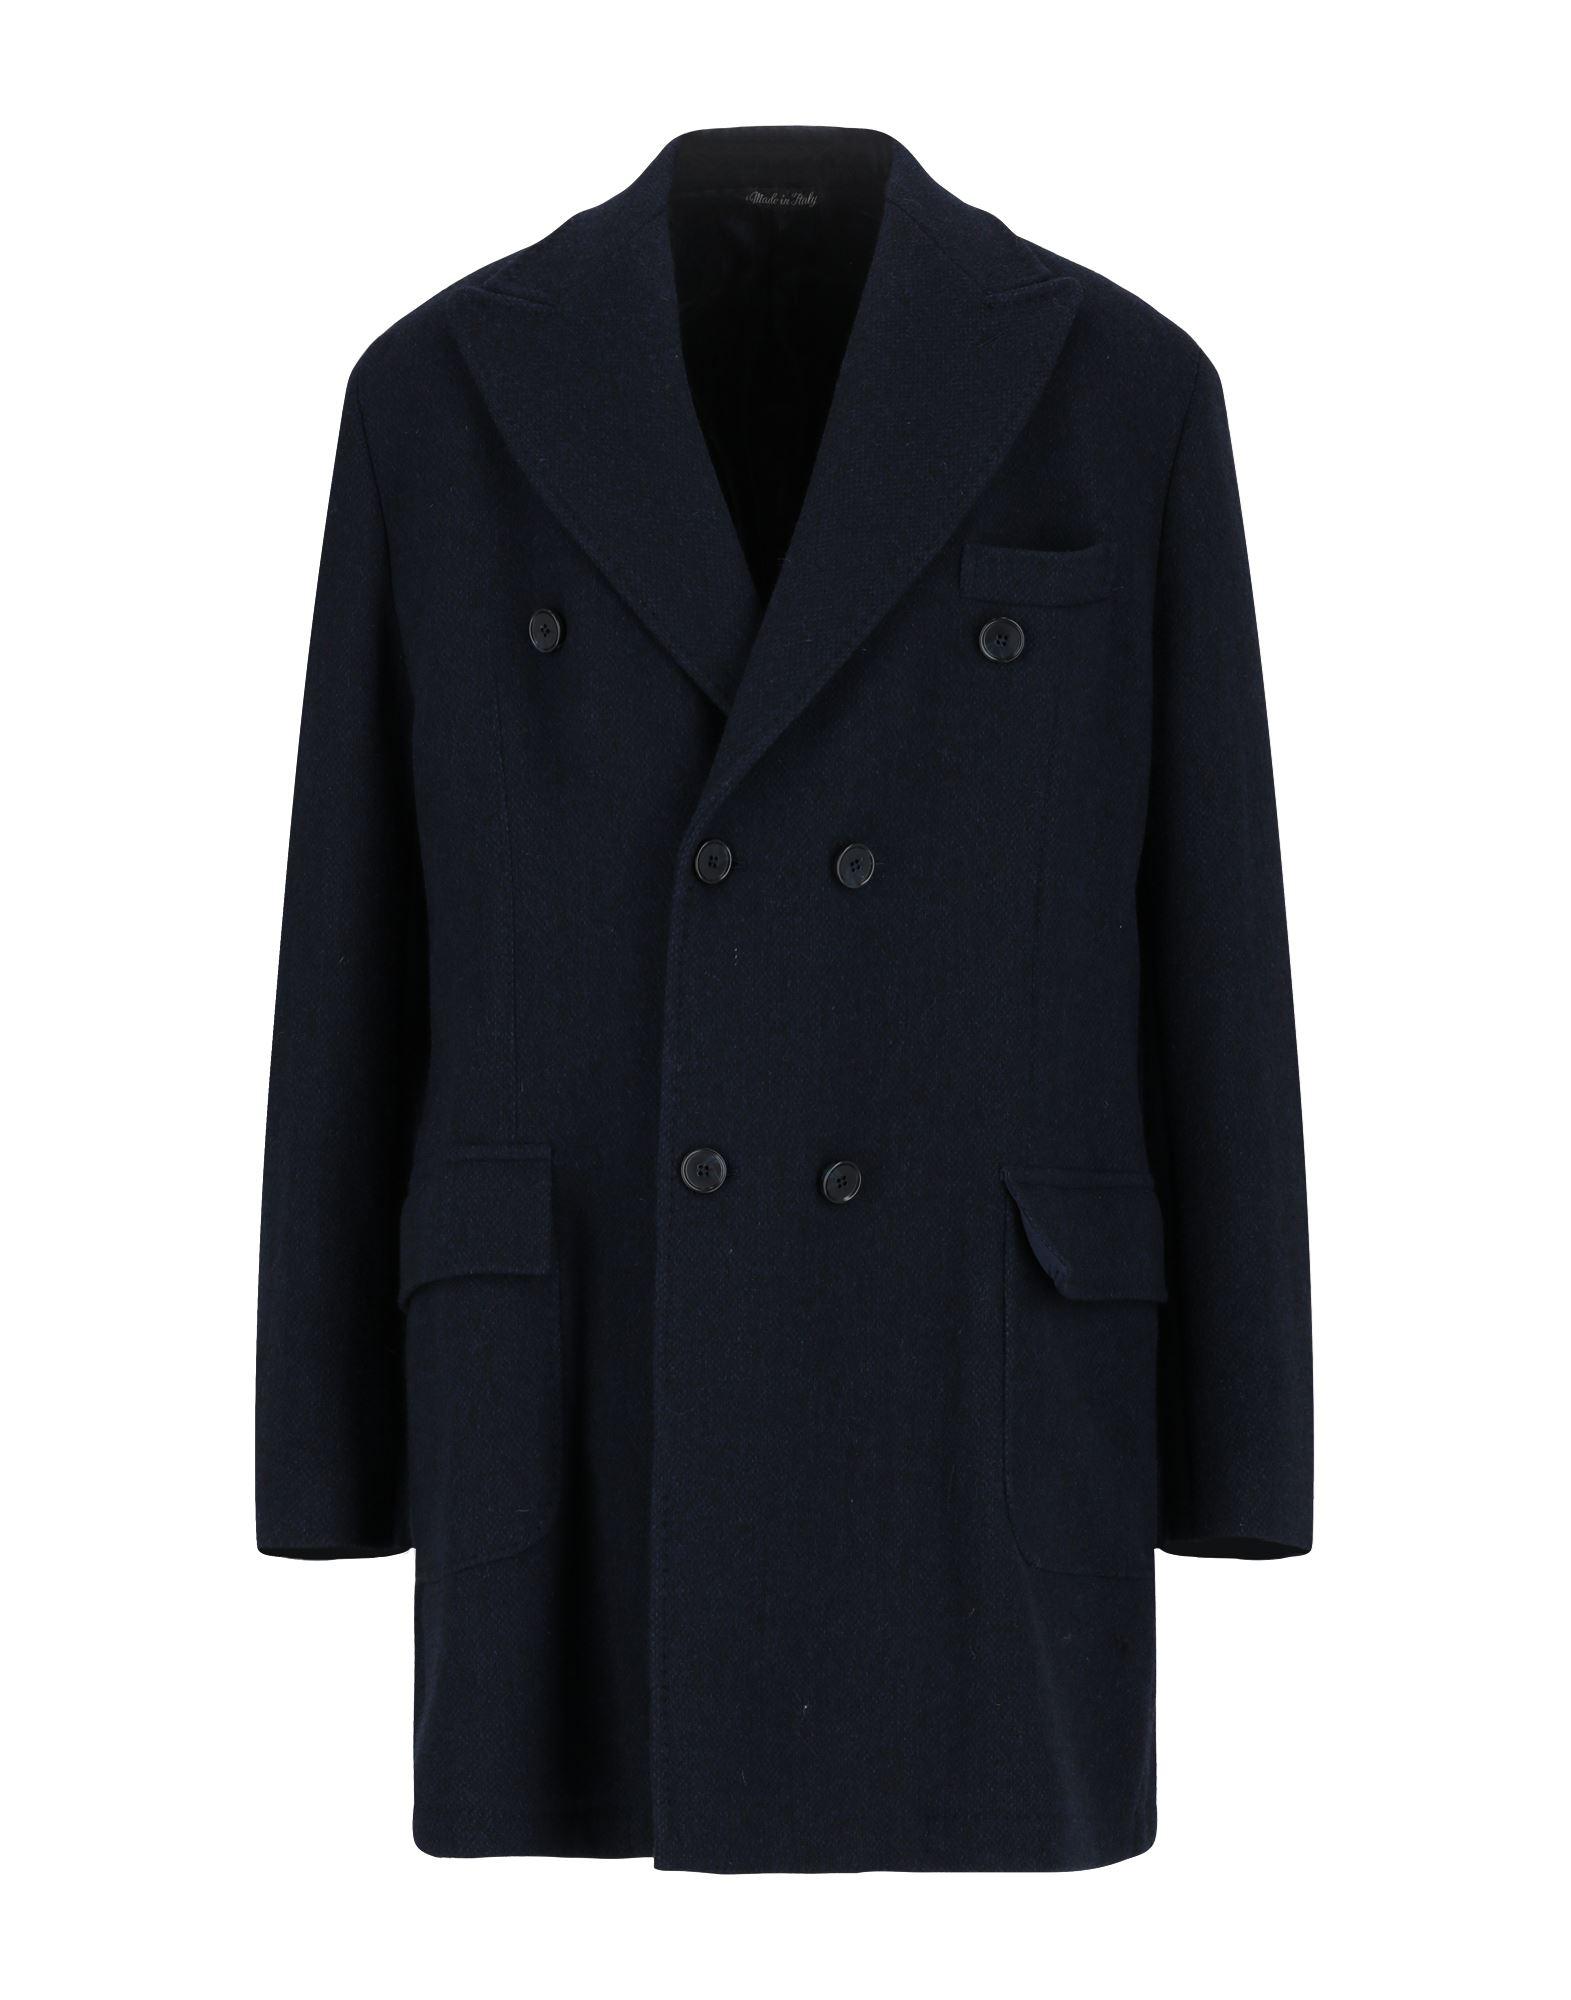 maxi ho пальто MAXI HO Пальто